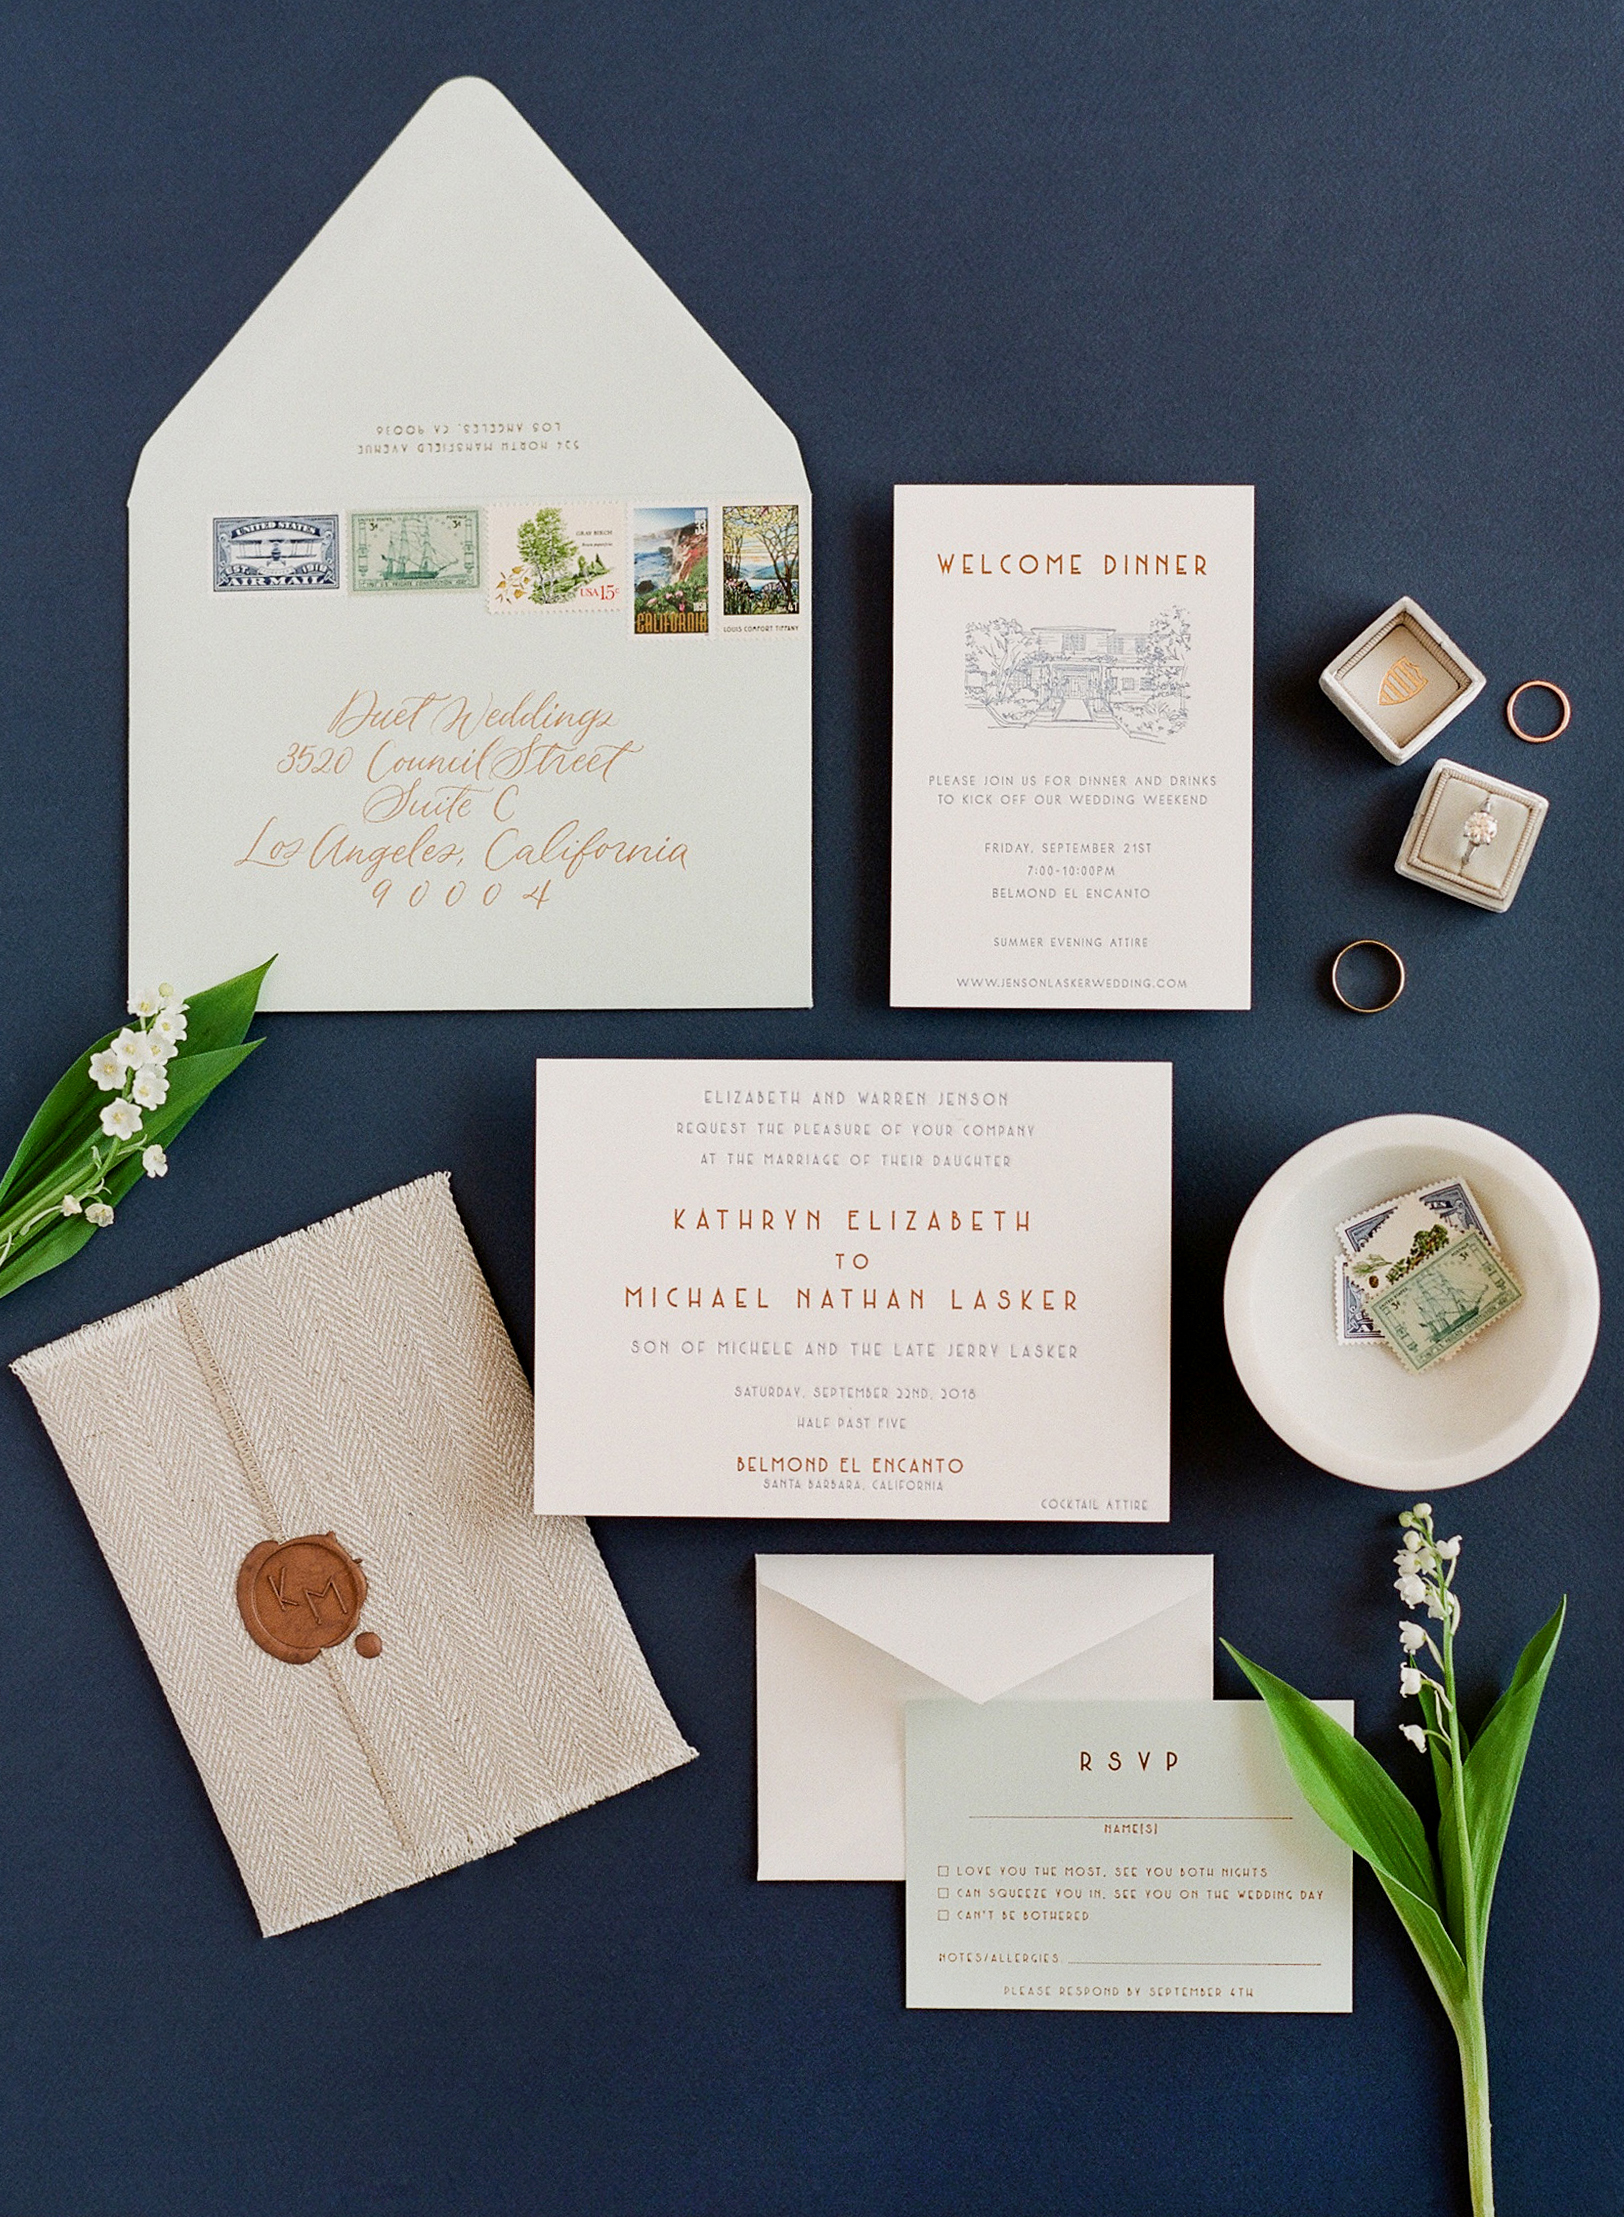 katy michael wedding invitation suite